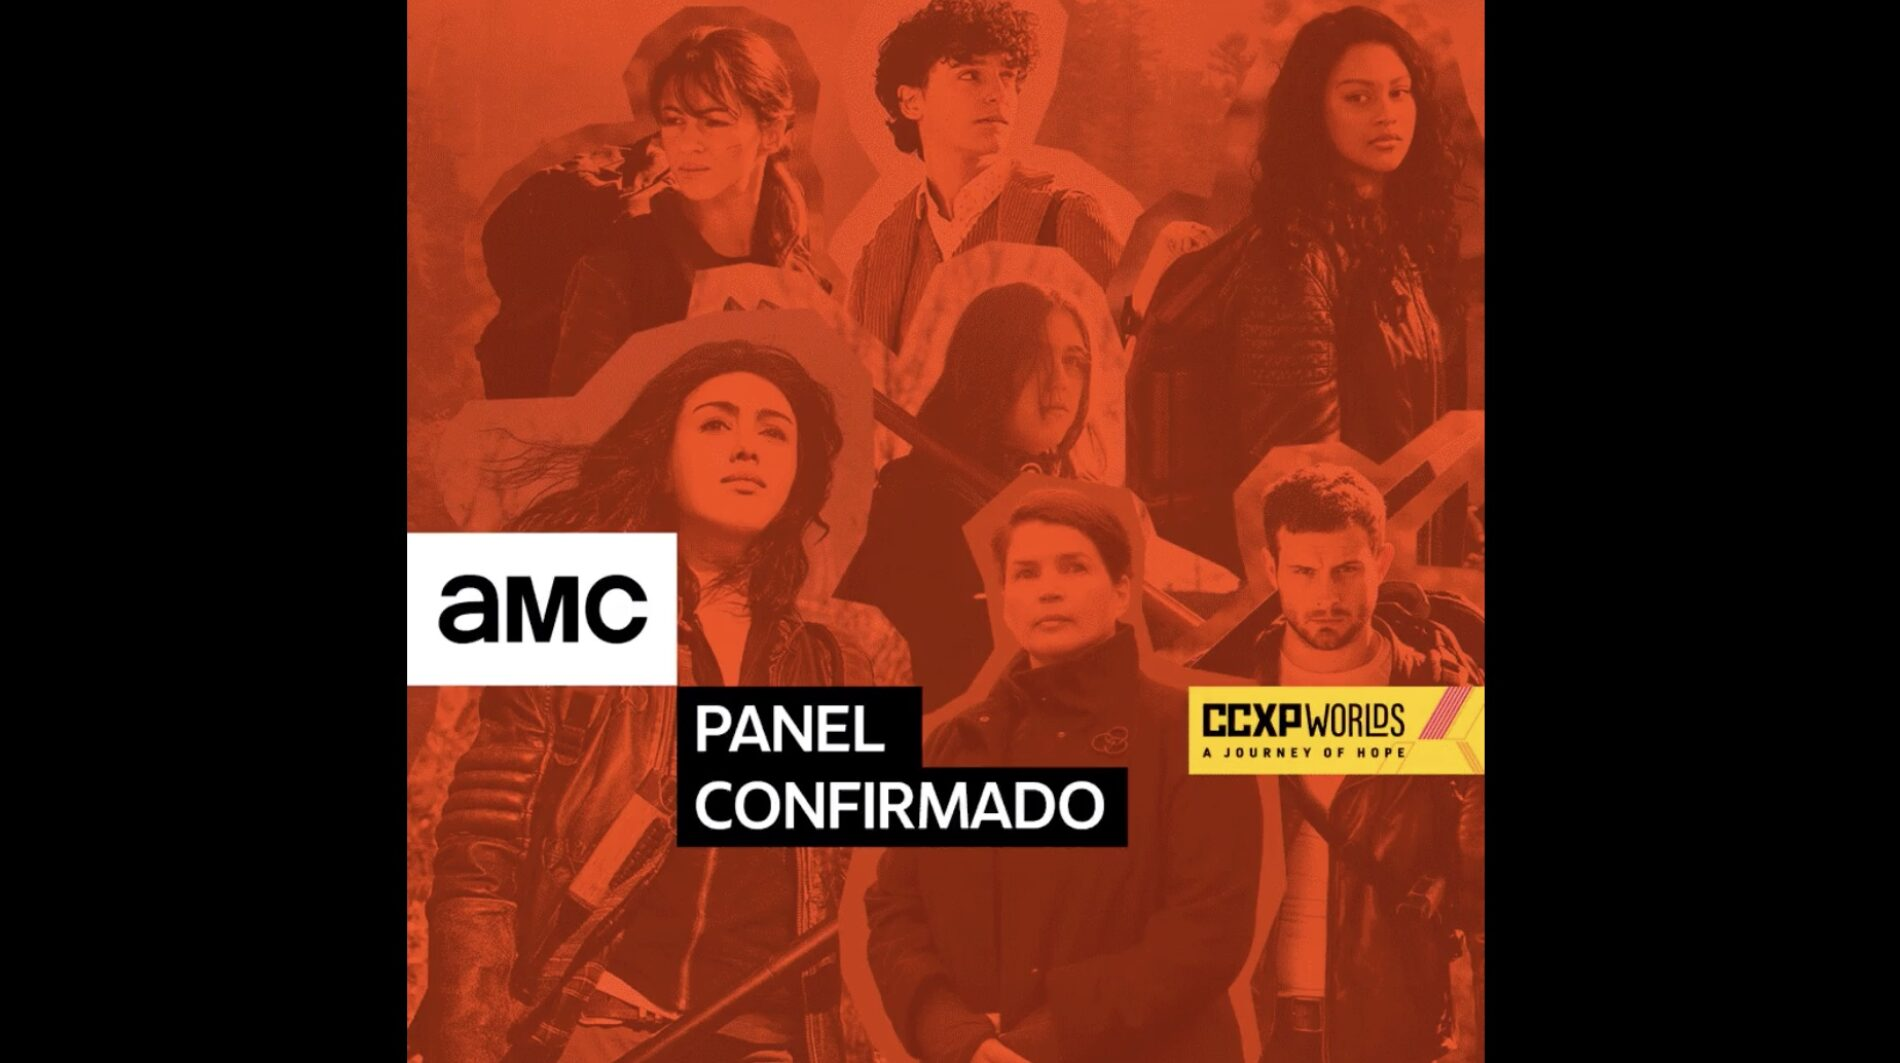 AMC confirma repartode'The Walking Dead: World Beyond' en CCXP Worlds